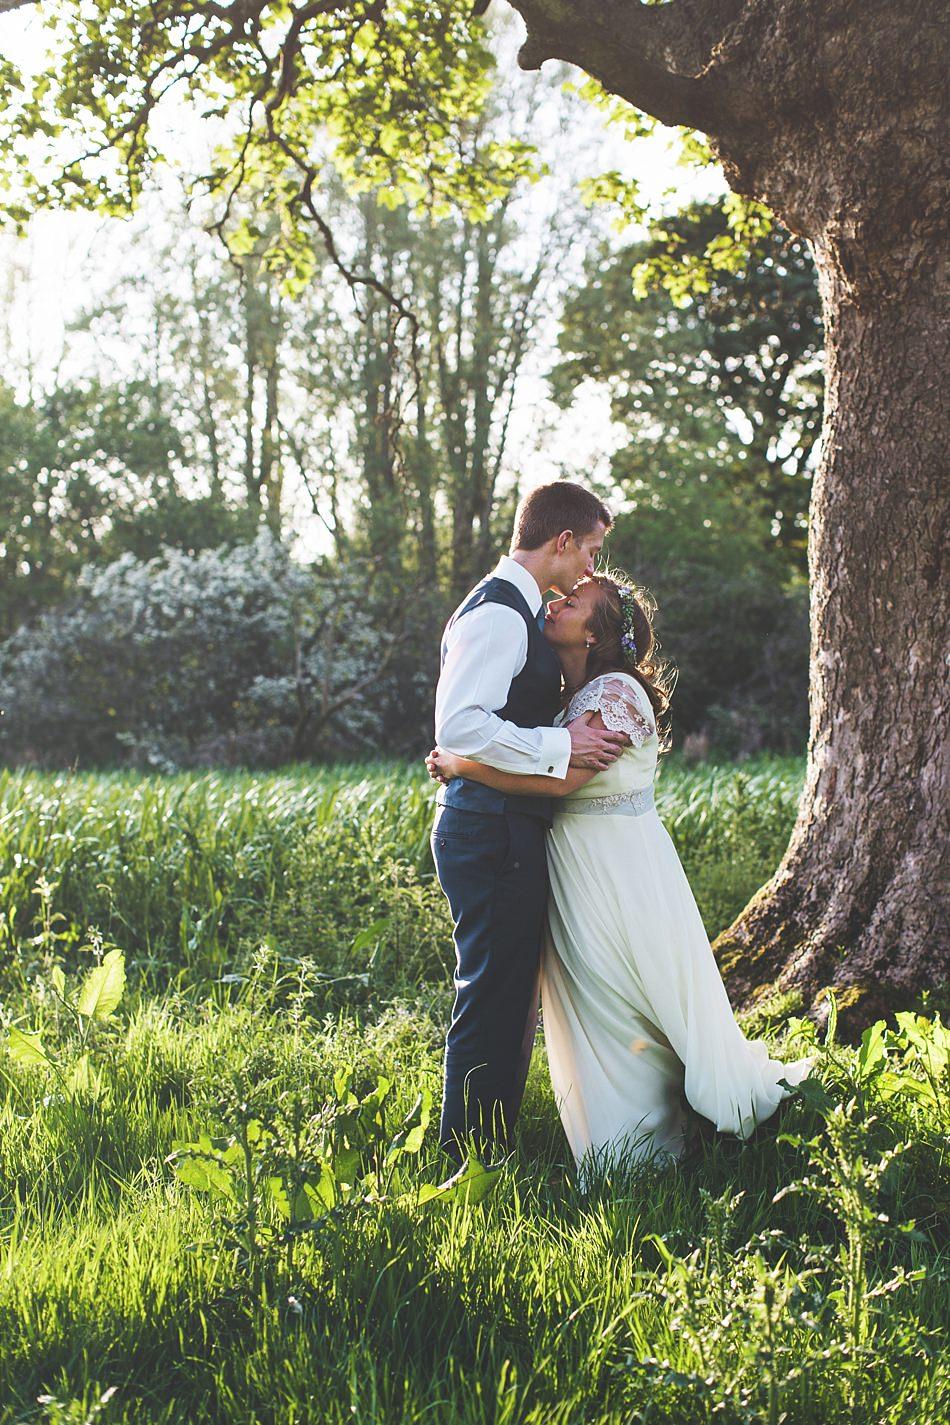 creative wedding photographers scotland 7-2.jpg